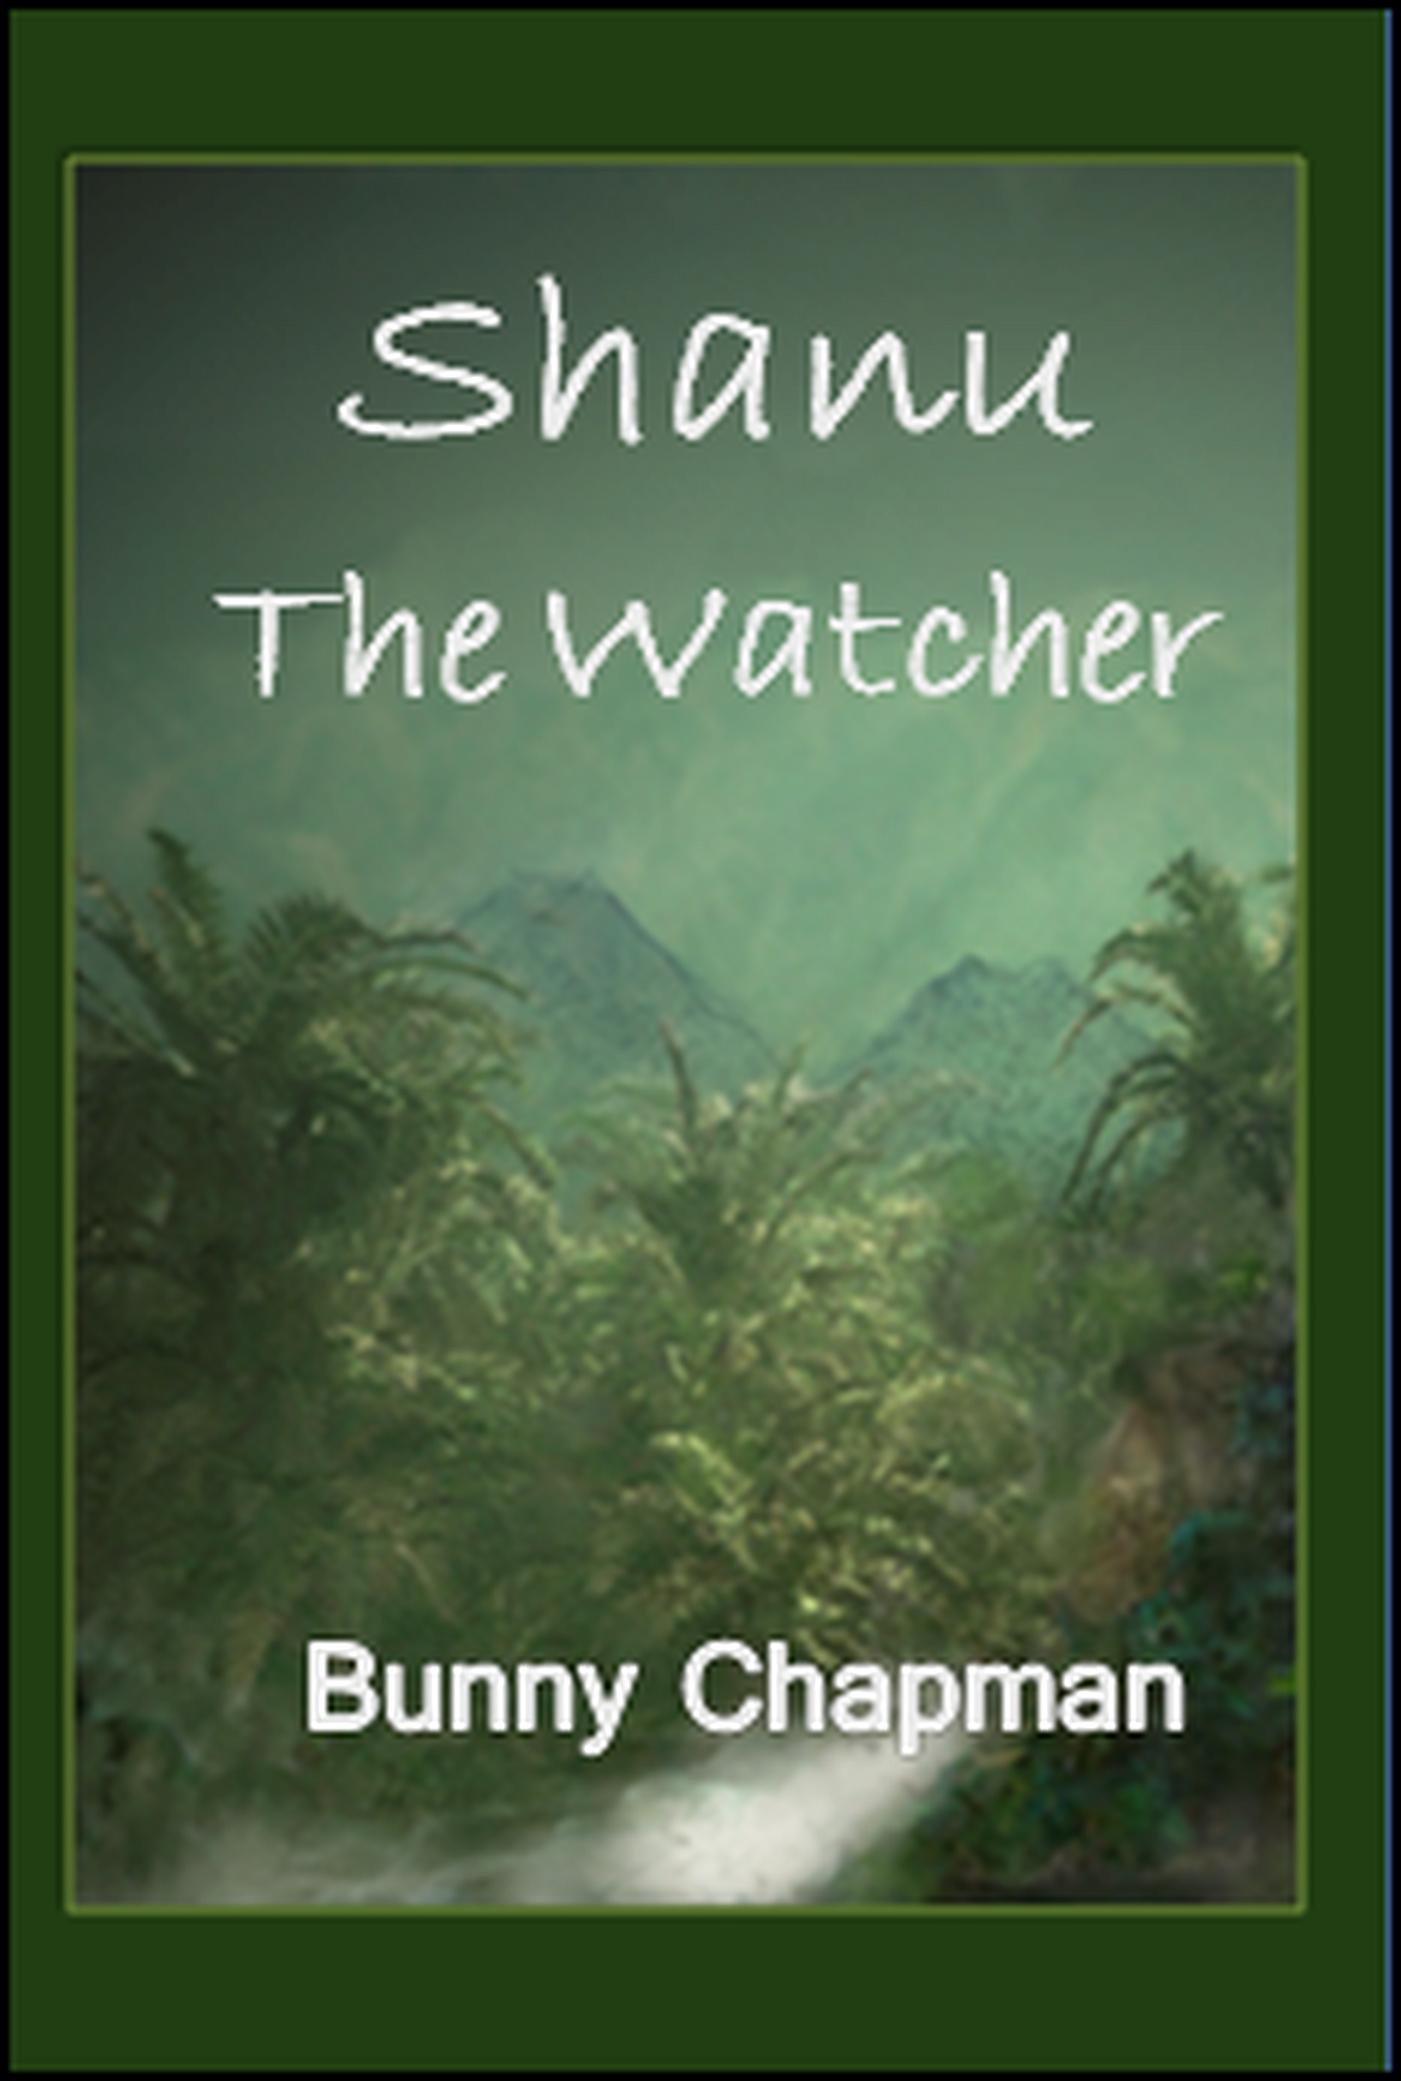 Shanu The Watcher